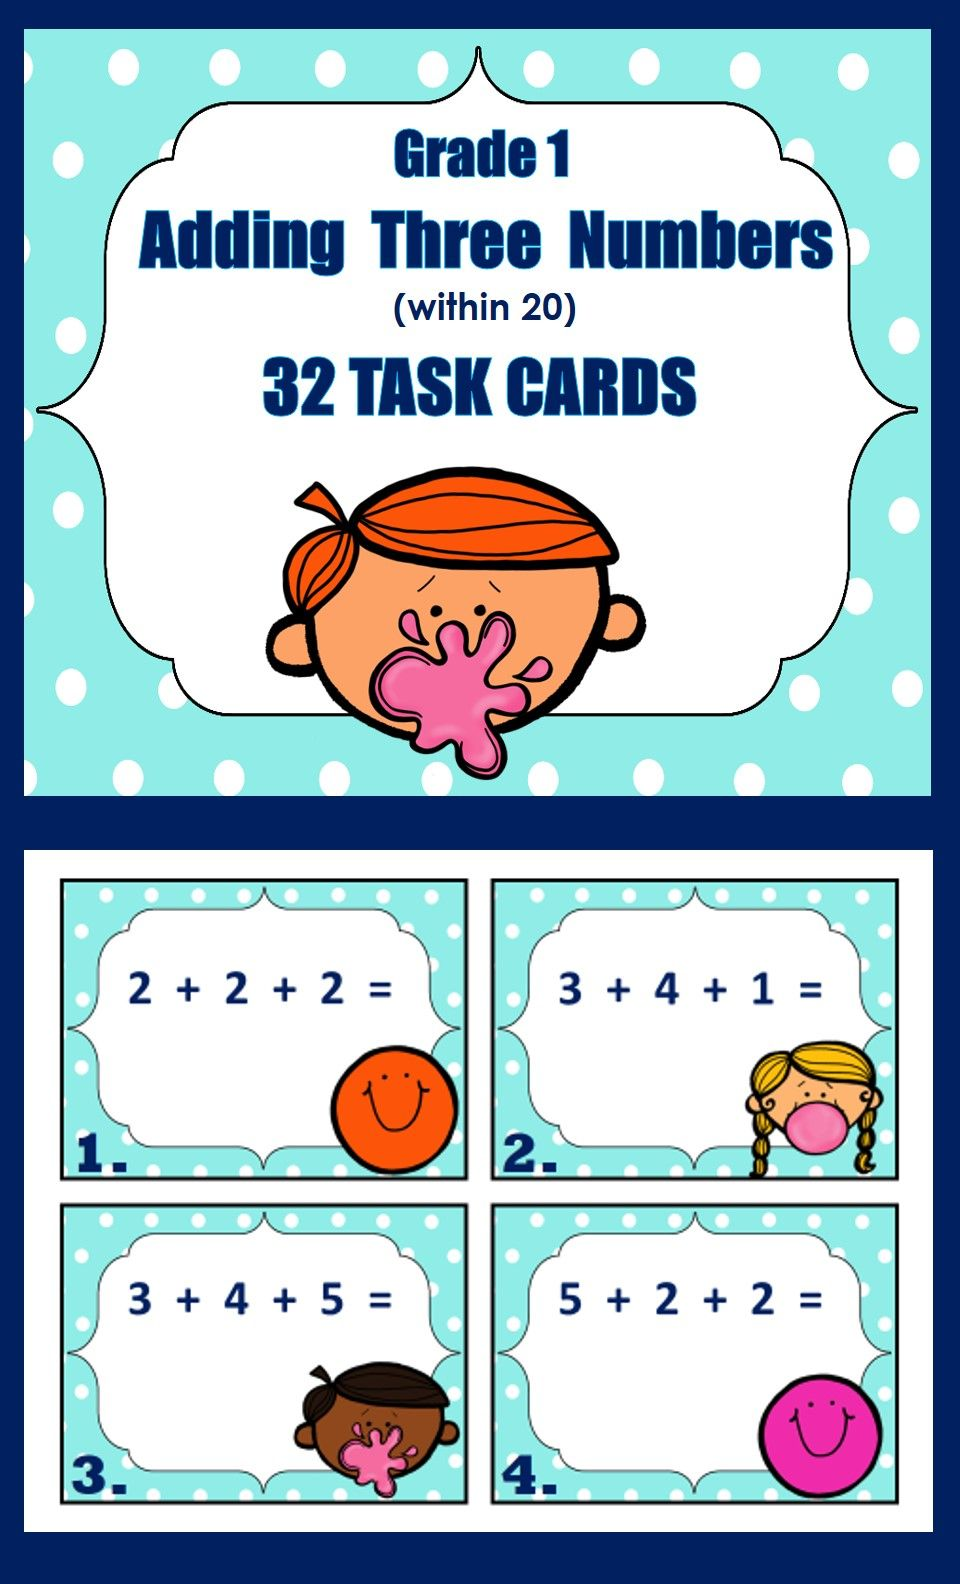 Adding Three 1-Digit Numbers   Elementary Math, K-6   Pinterest ...